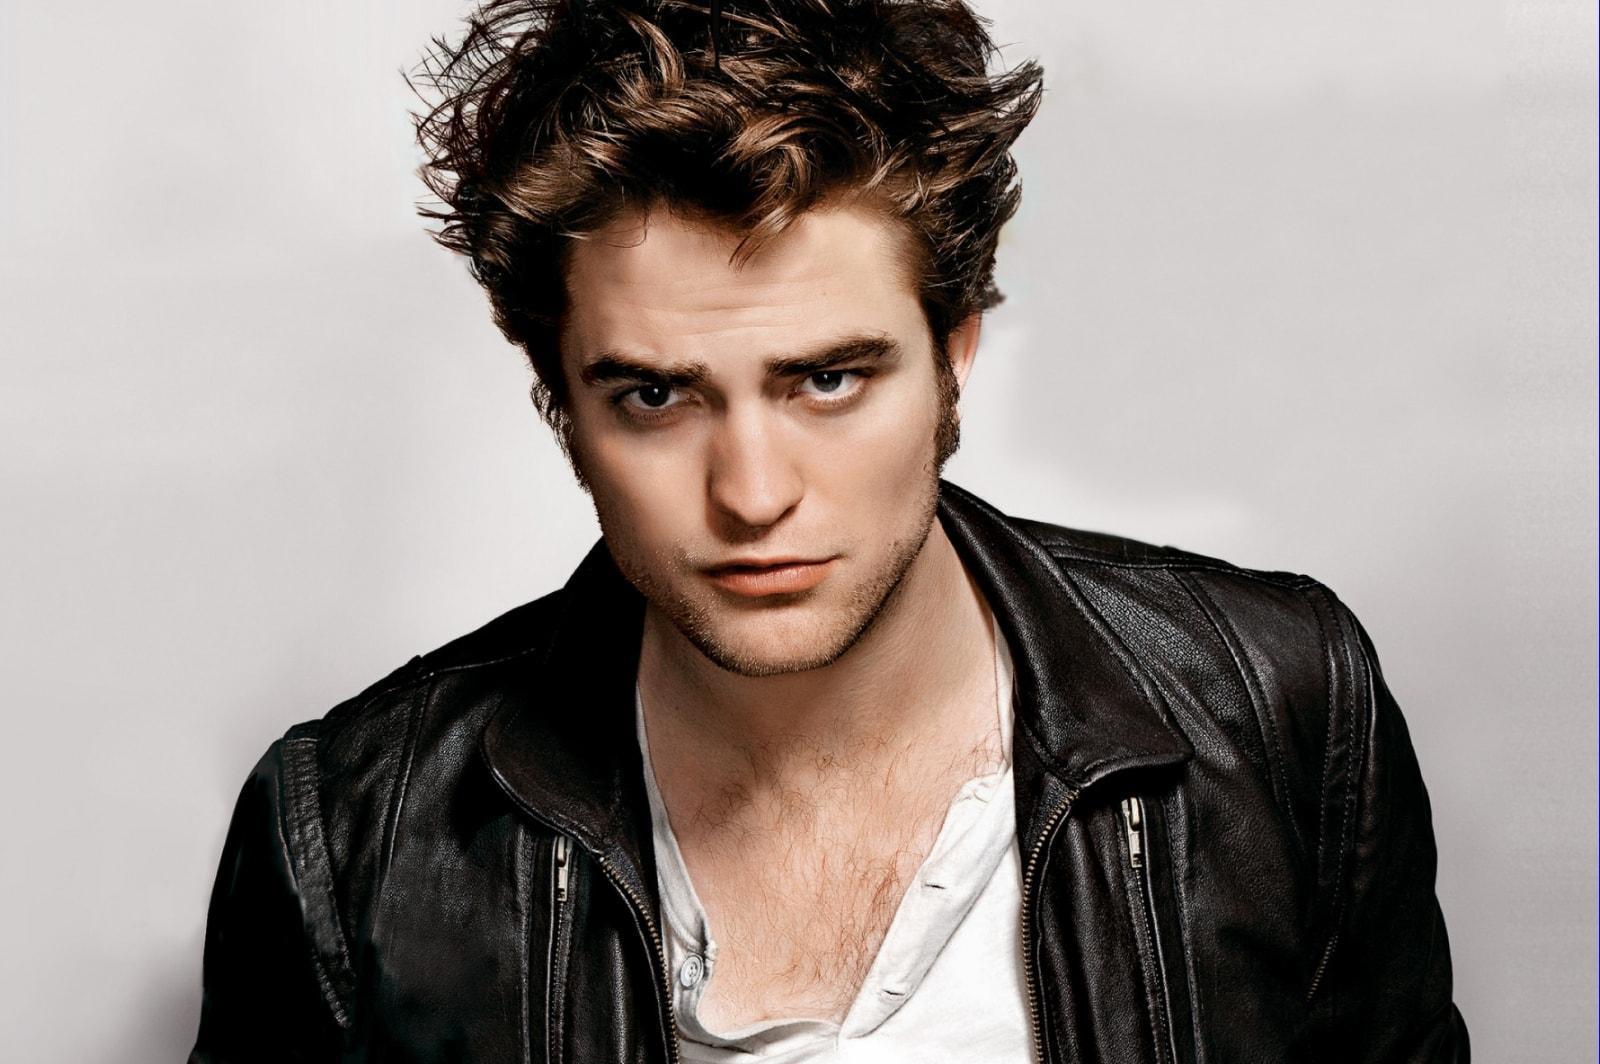 Robert Pattinson Frontal Nude And Gay Sex Video - Men